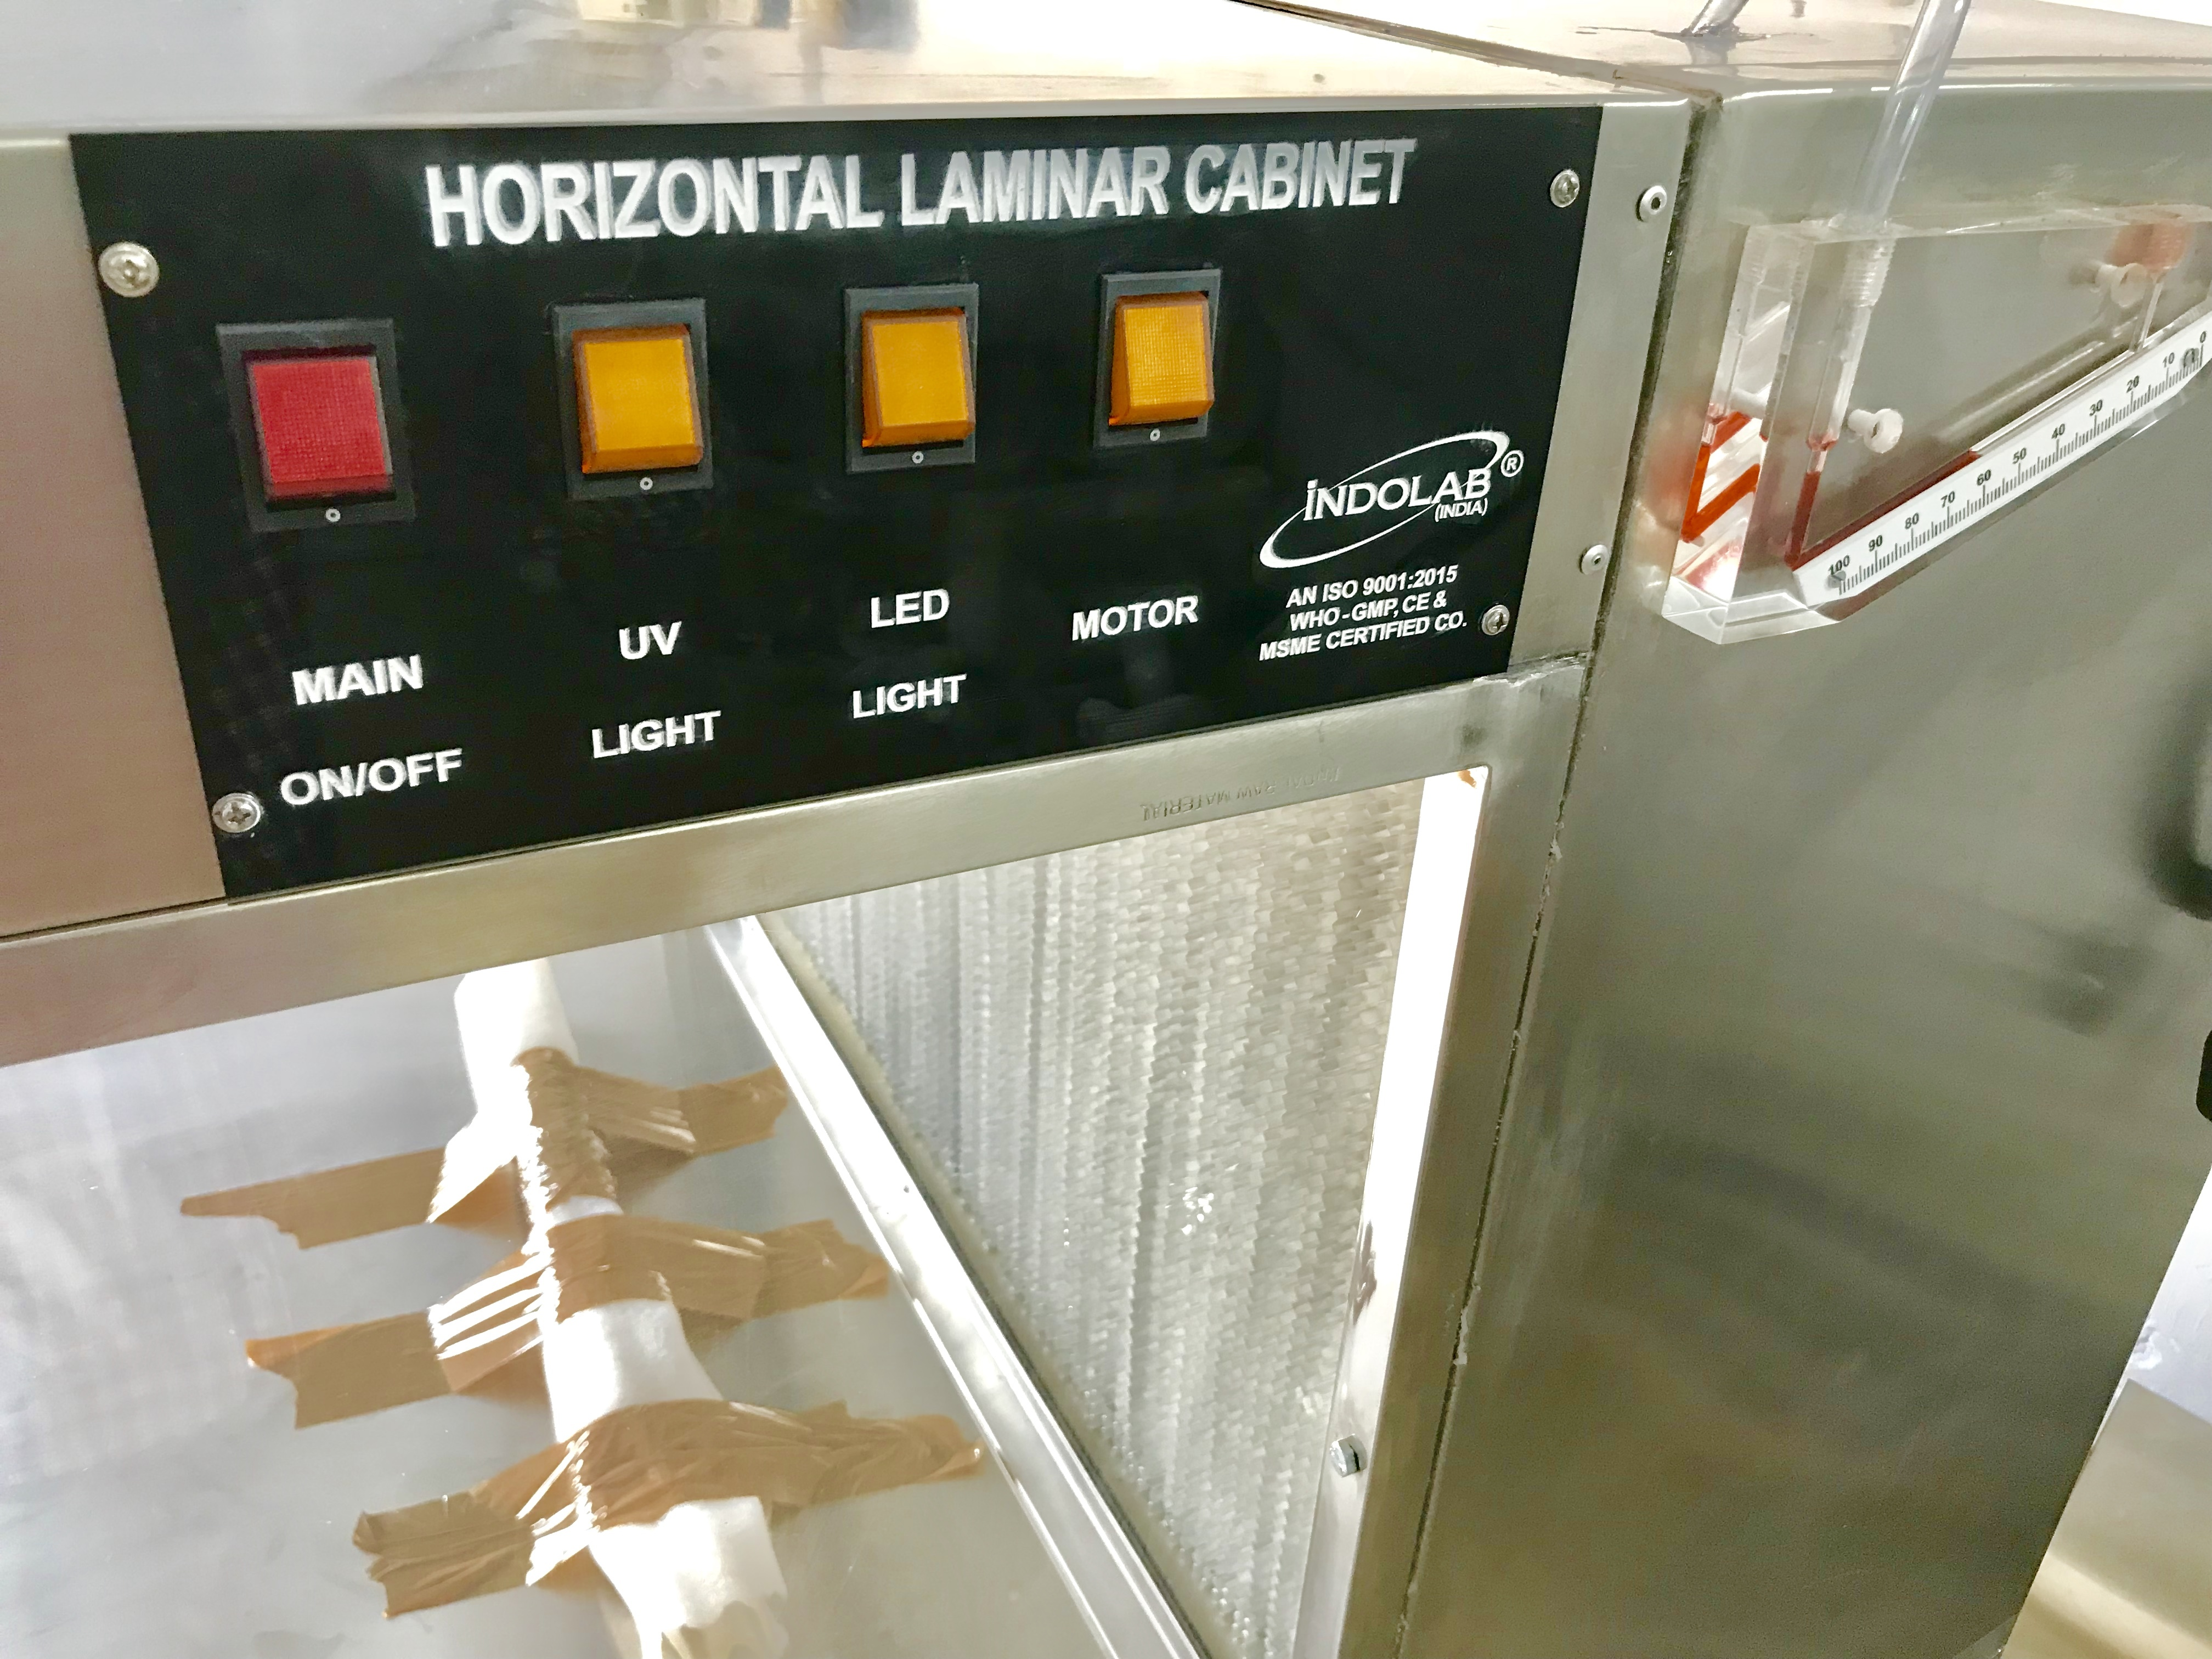 HORIZONTAL LAMINAR AIR FLOW